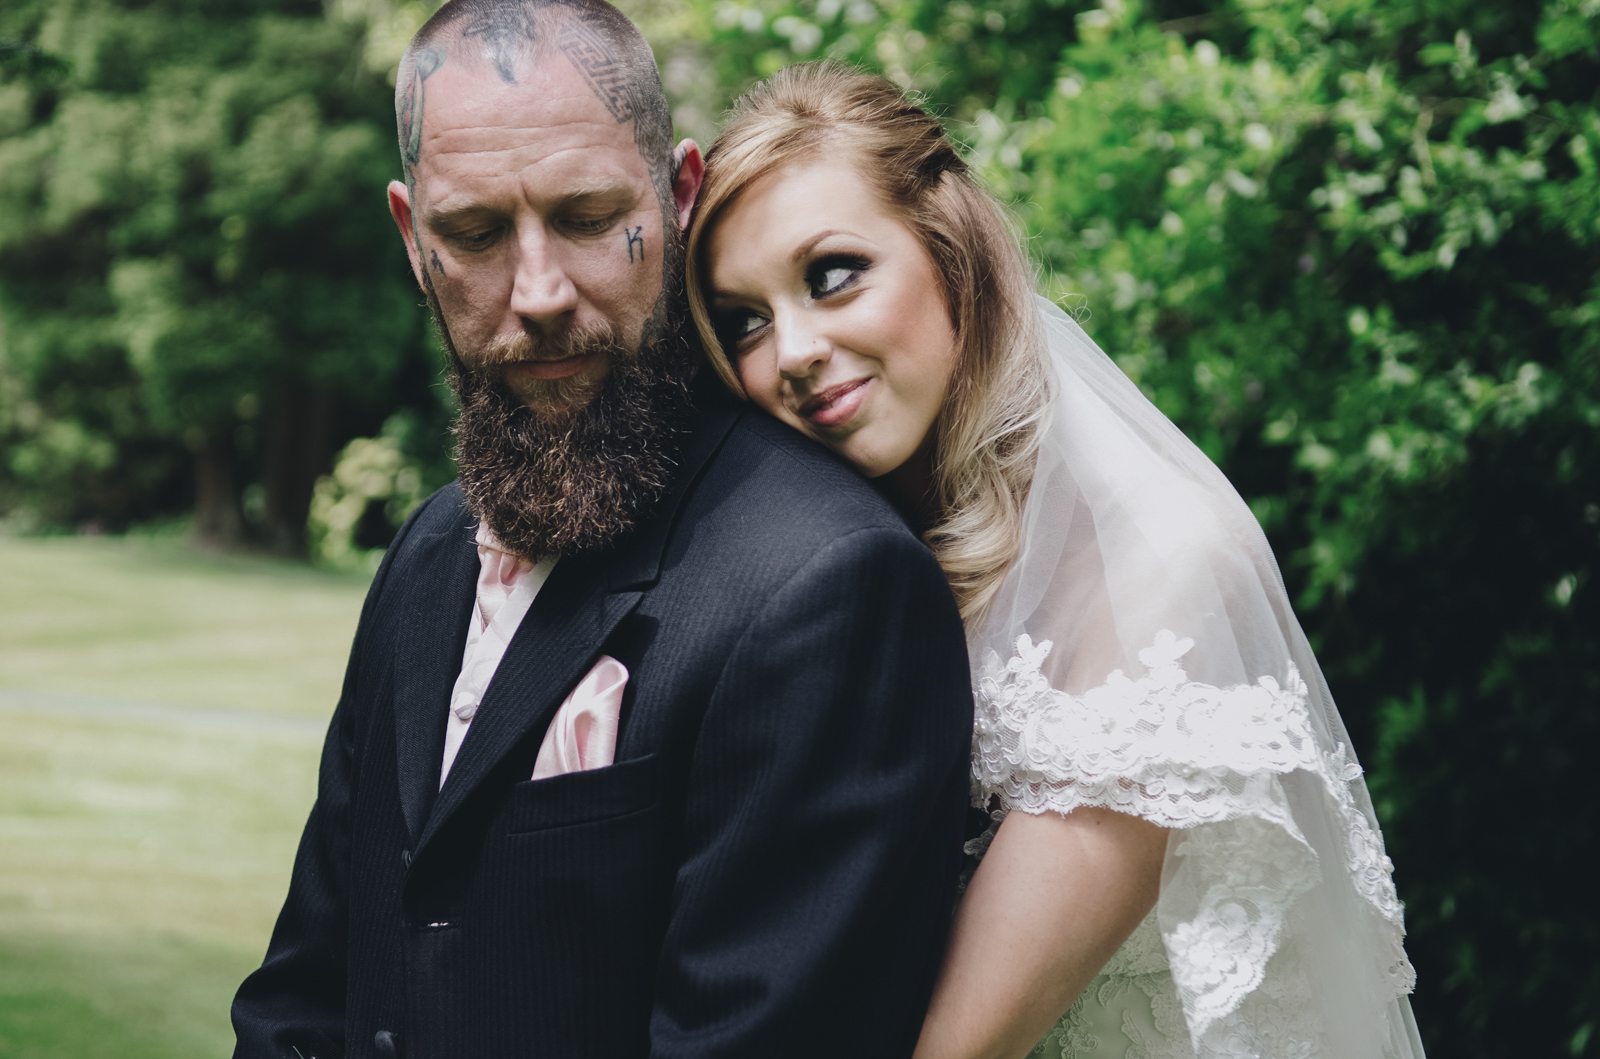 Alternative-North-West-Manchester-Wedding-Photography-Astley-bank-Wedding-skull-cake-tattooed-groom-22.jpg